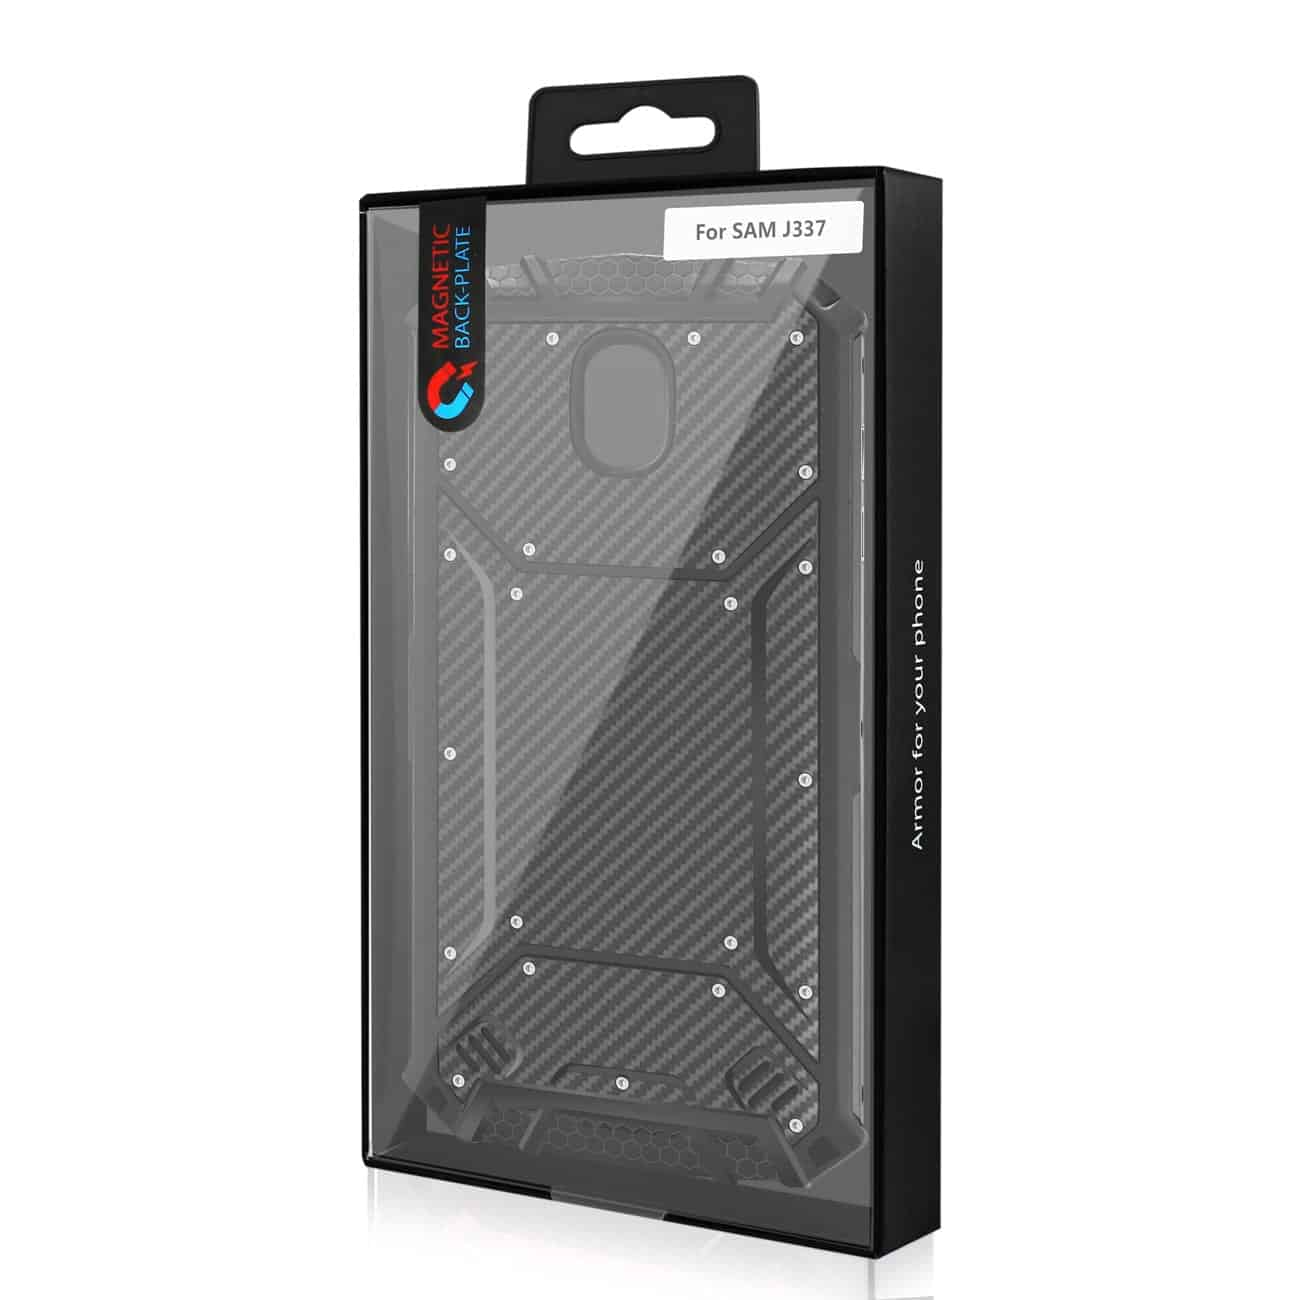 SAMSUNG GALAXY J3 (2018) Carbon Fiber Hard-shell Case In Black